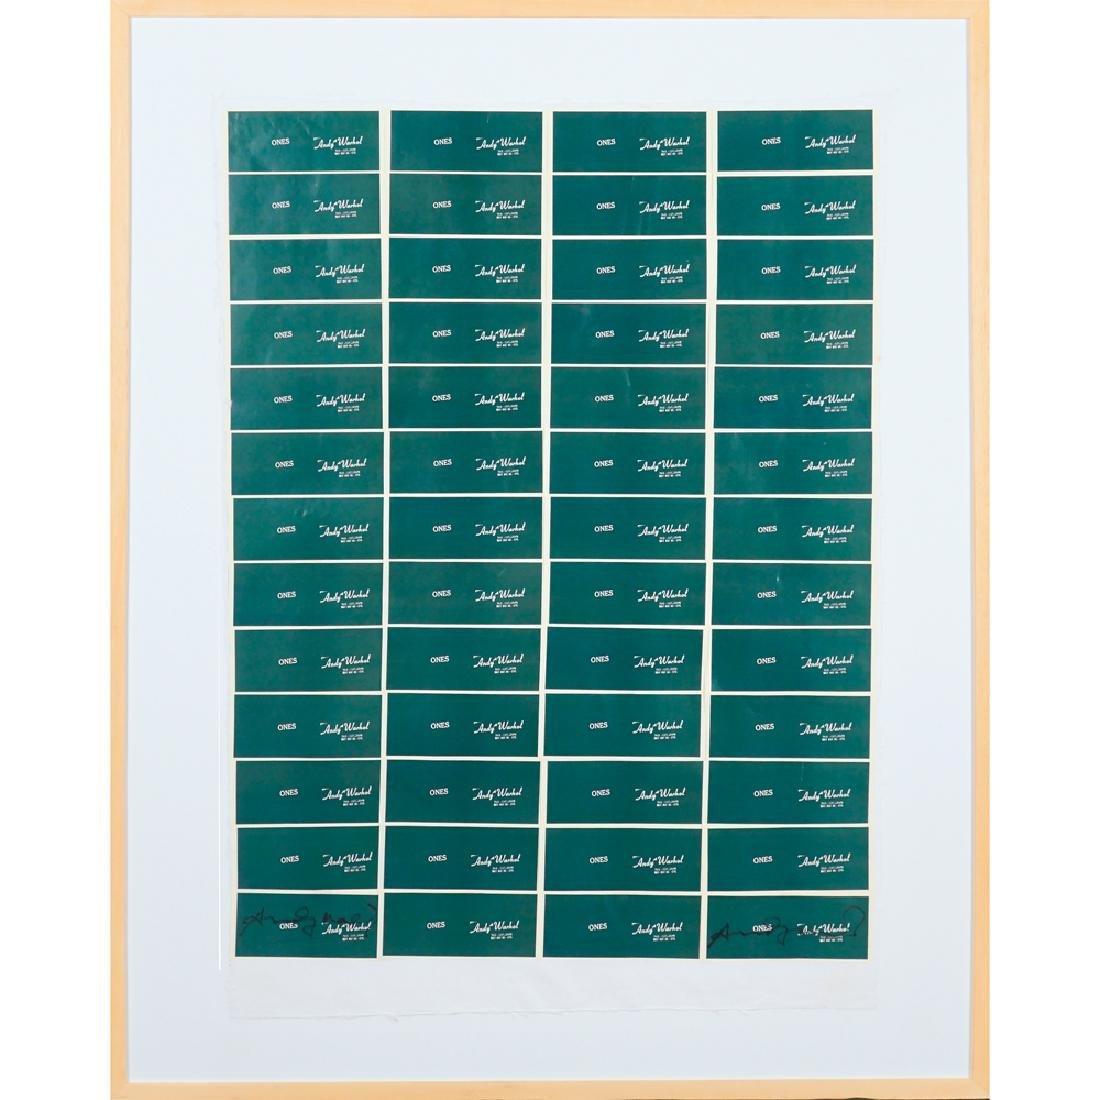 Andy Warhol Pittsburgh 1928 1928 -New York 1987 93x60cm